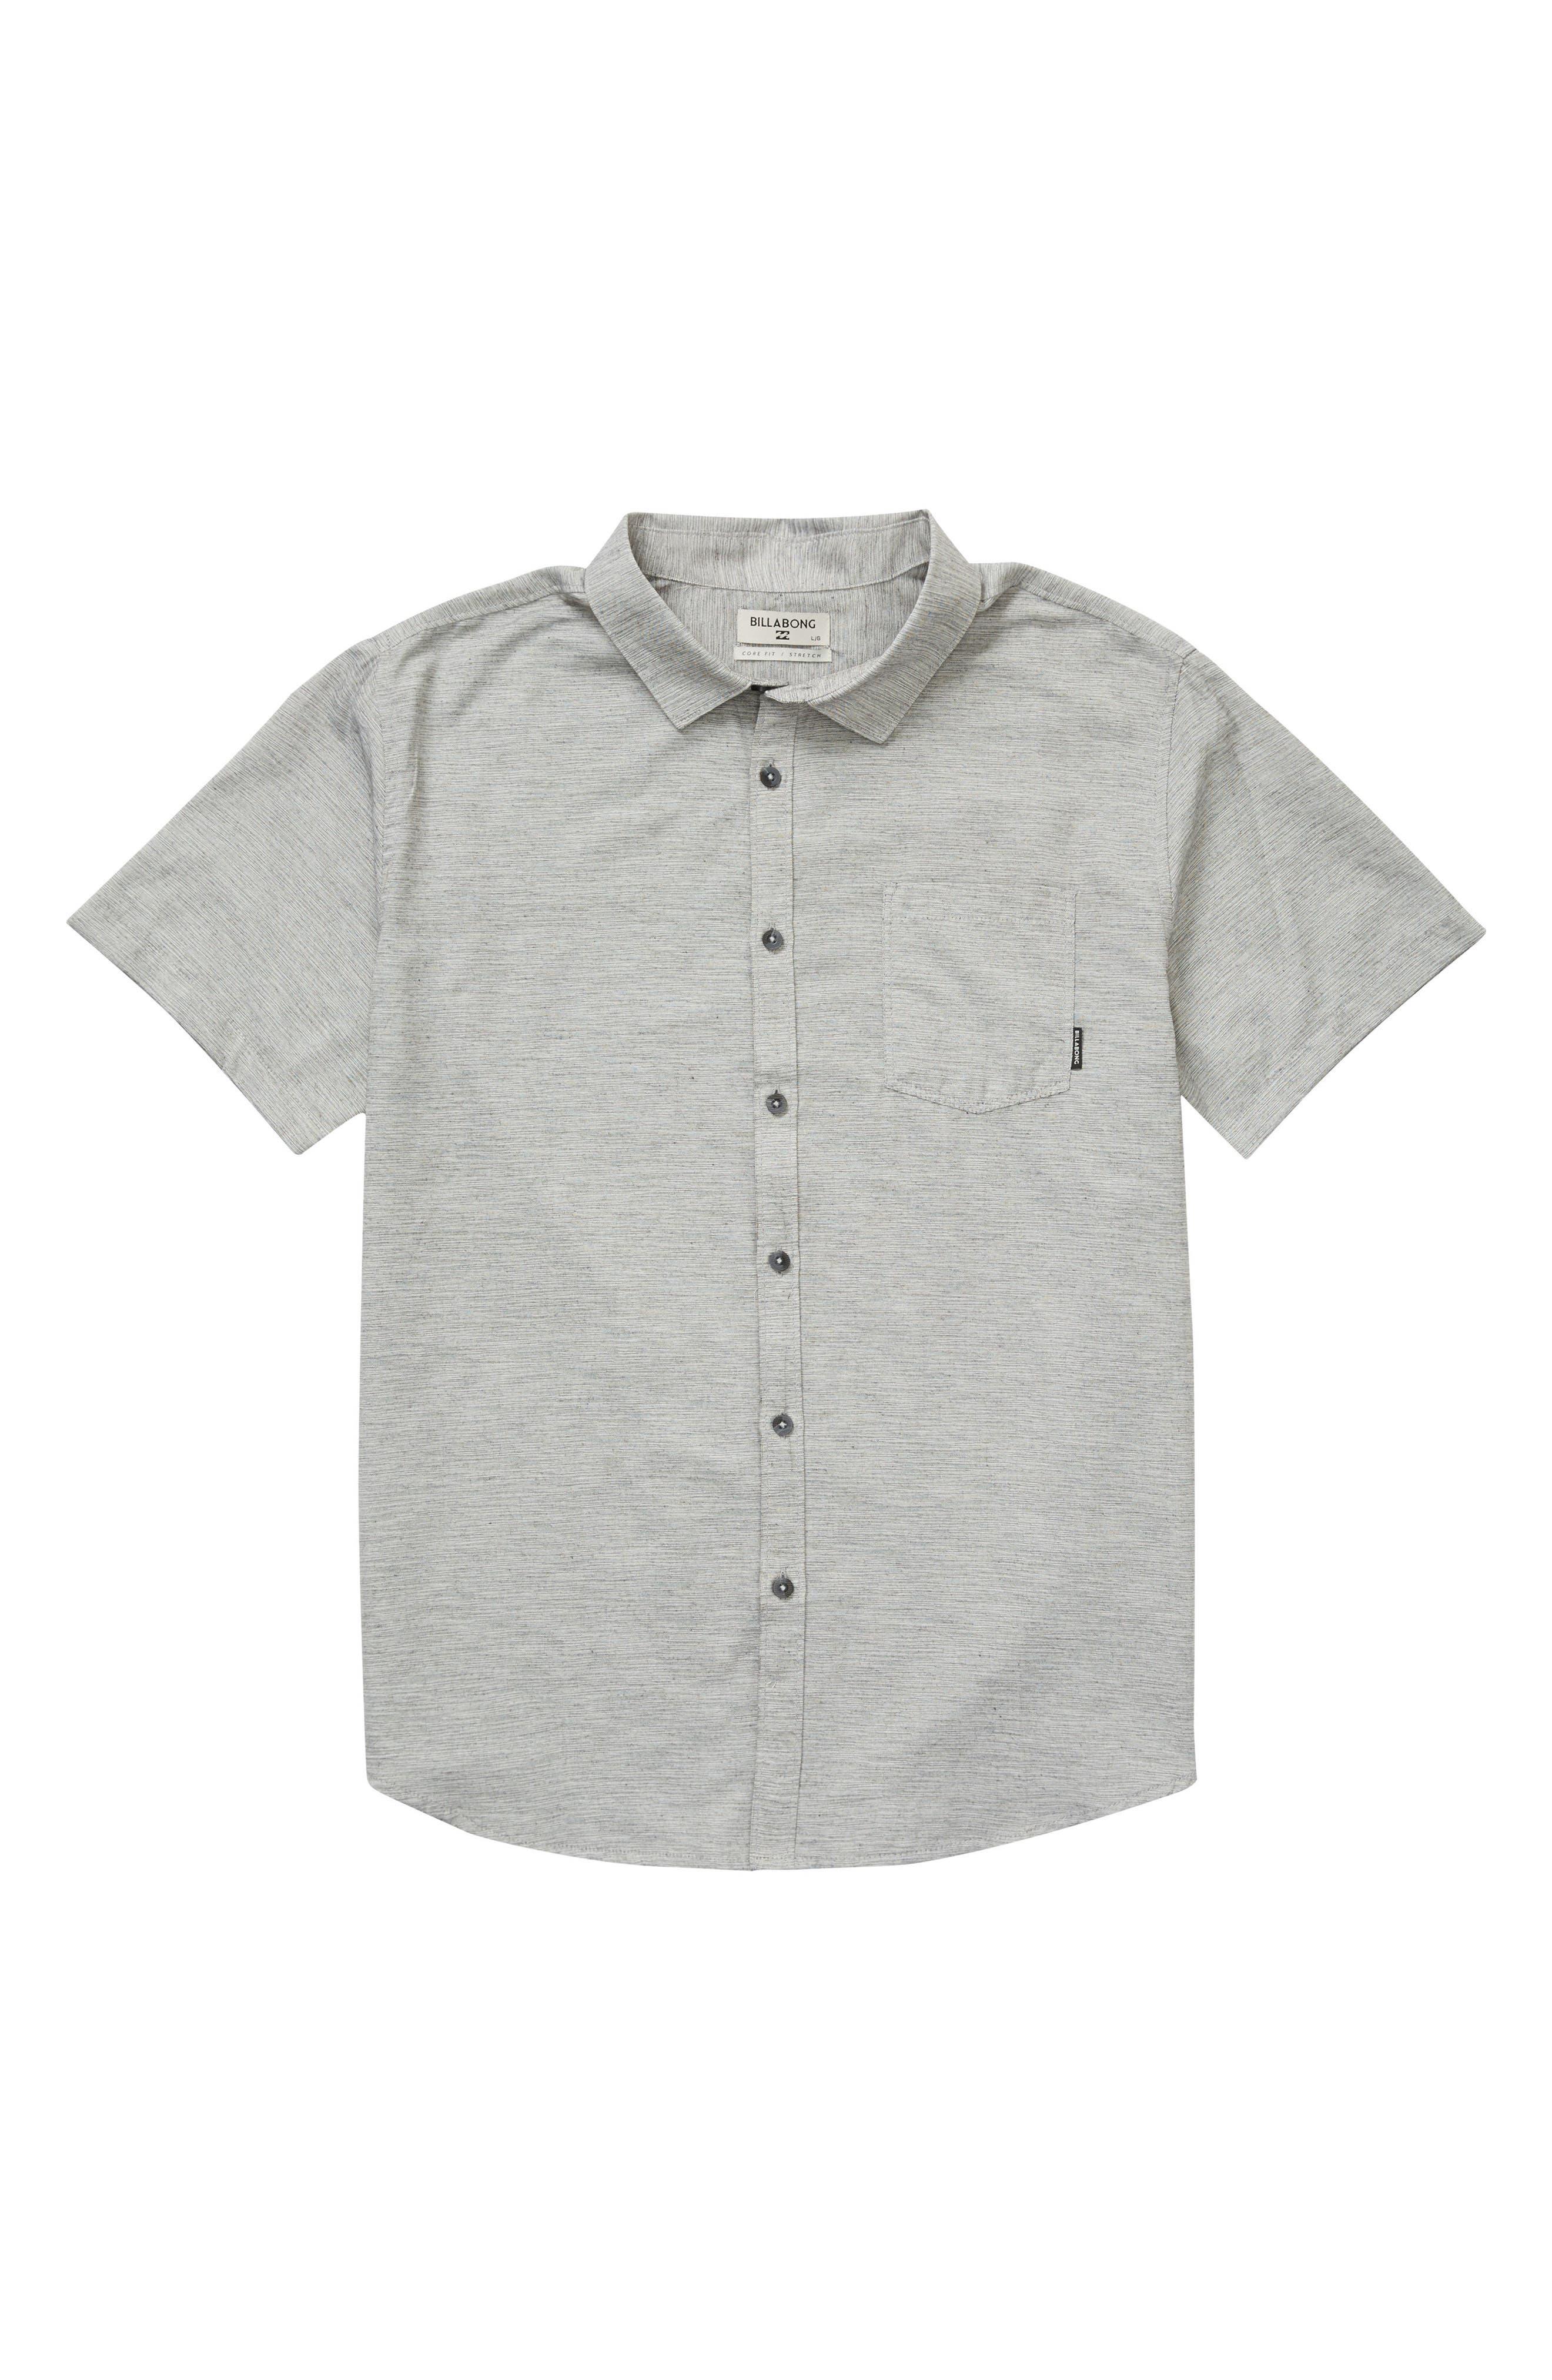 Main Image - Billabong All Day Helix Woven Shirt (Toddler Boys)